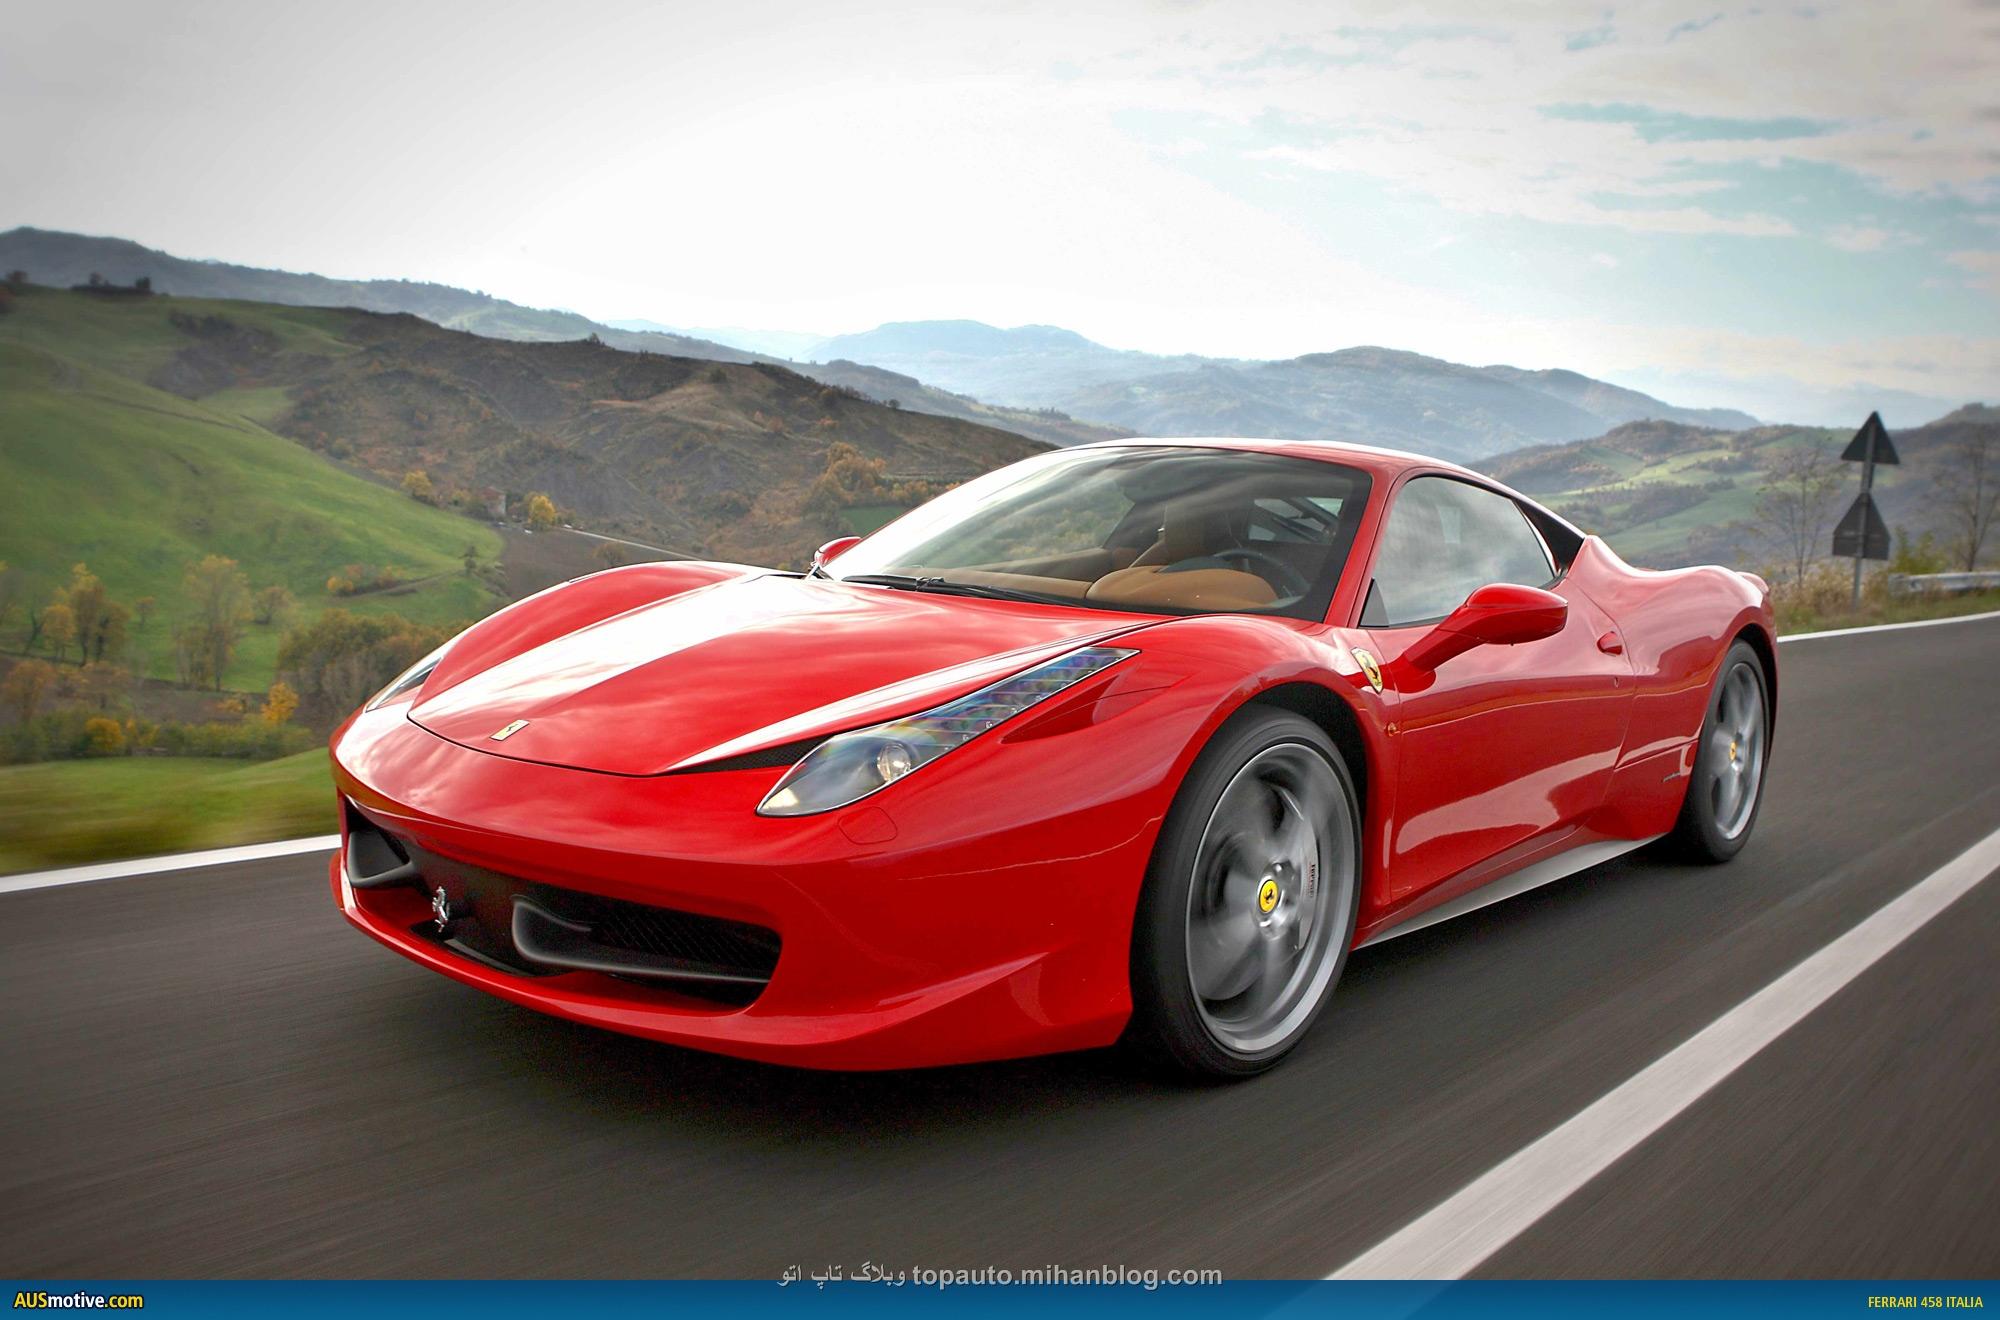 http://s4.picofile.com/file/7797781284/Ferrari_458_Italia_25.jpg